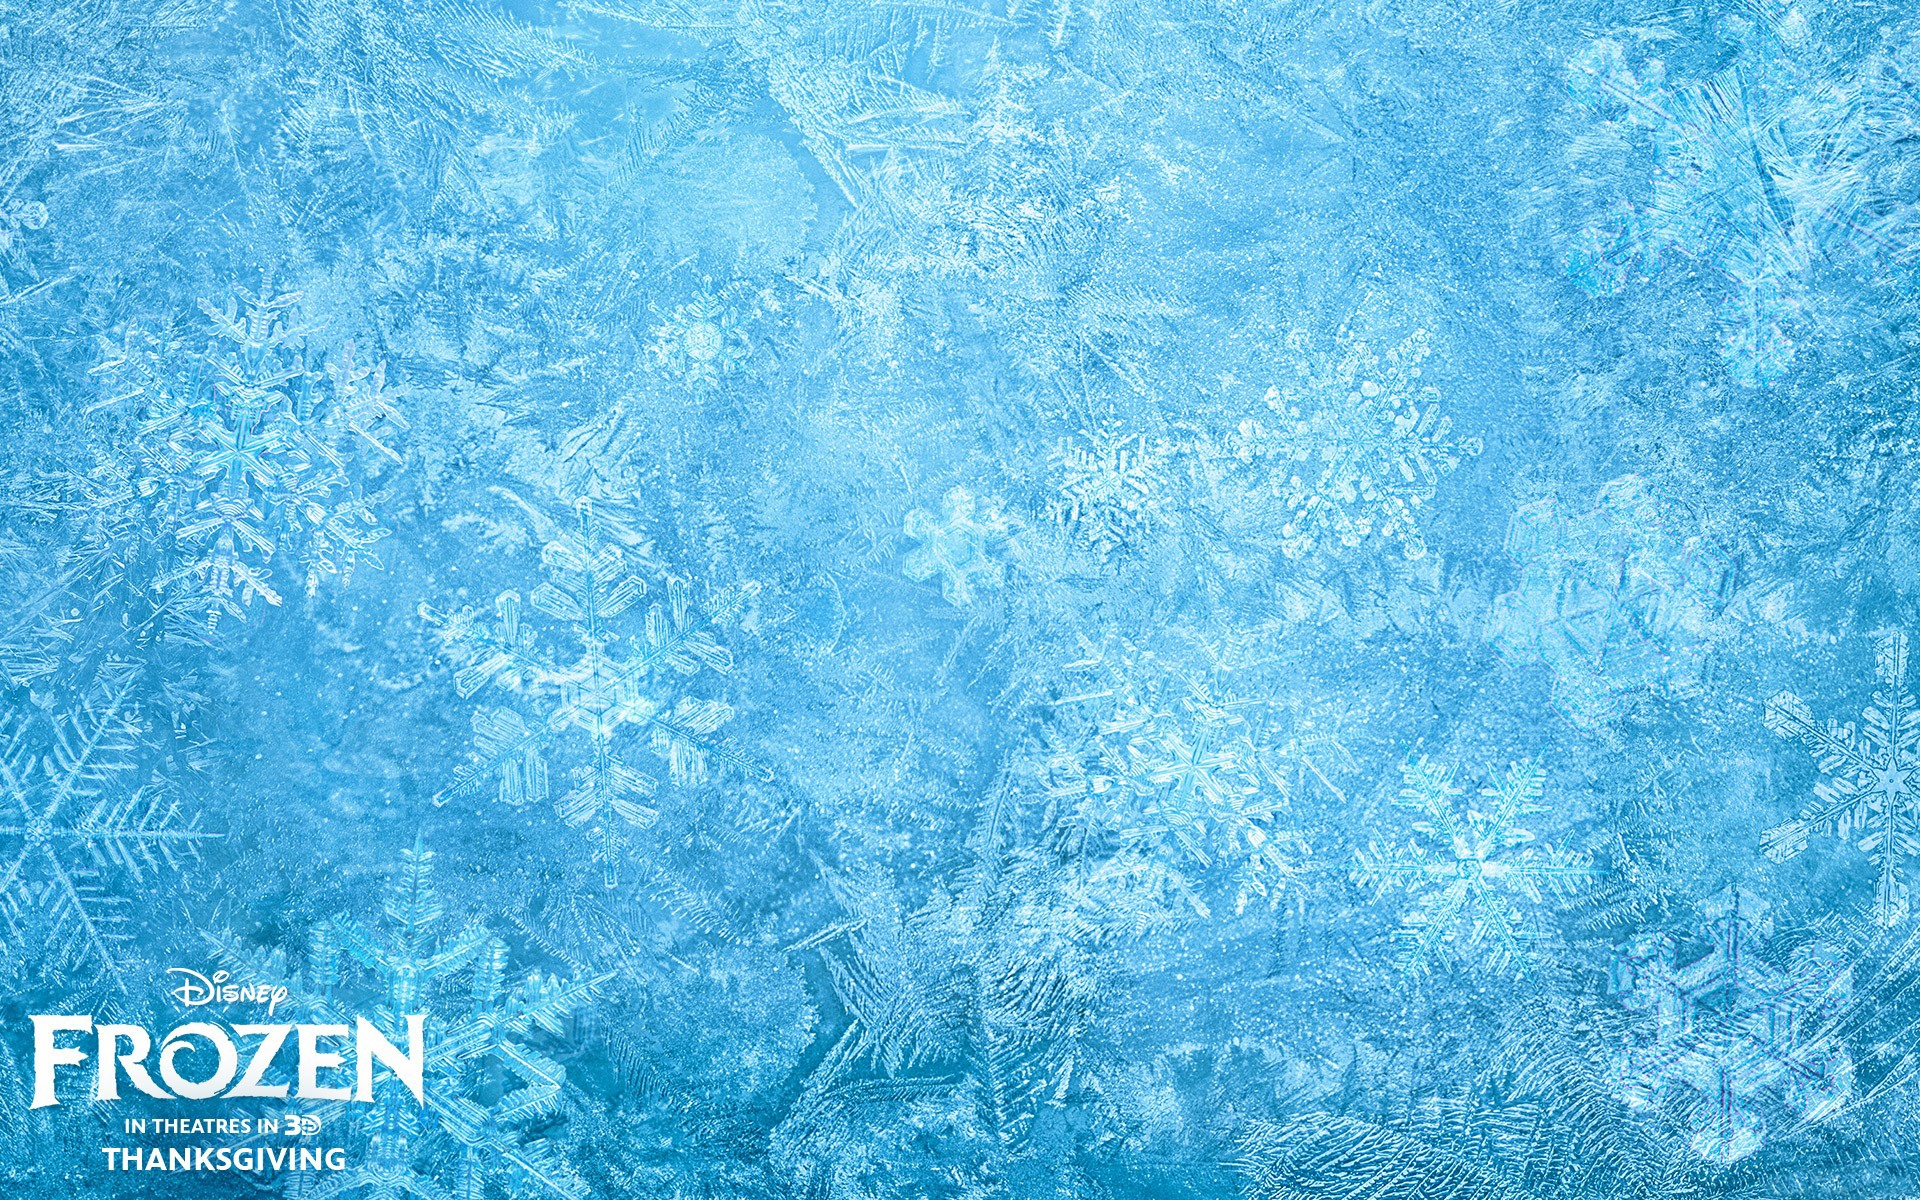 Free Desktop Wallpaper Niagara Falls Frozen Wallpapers And Desktop Backgrounds Up To 8k